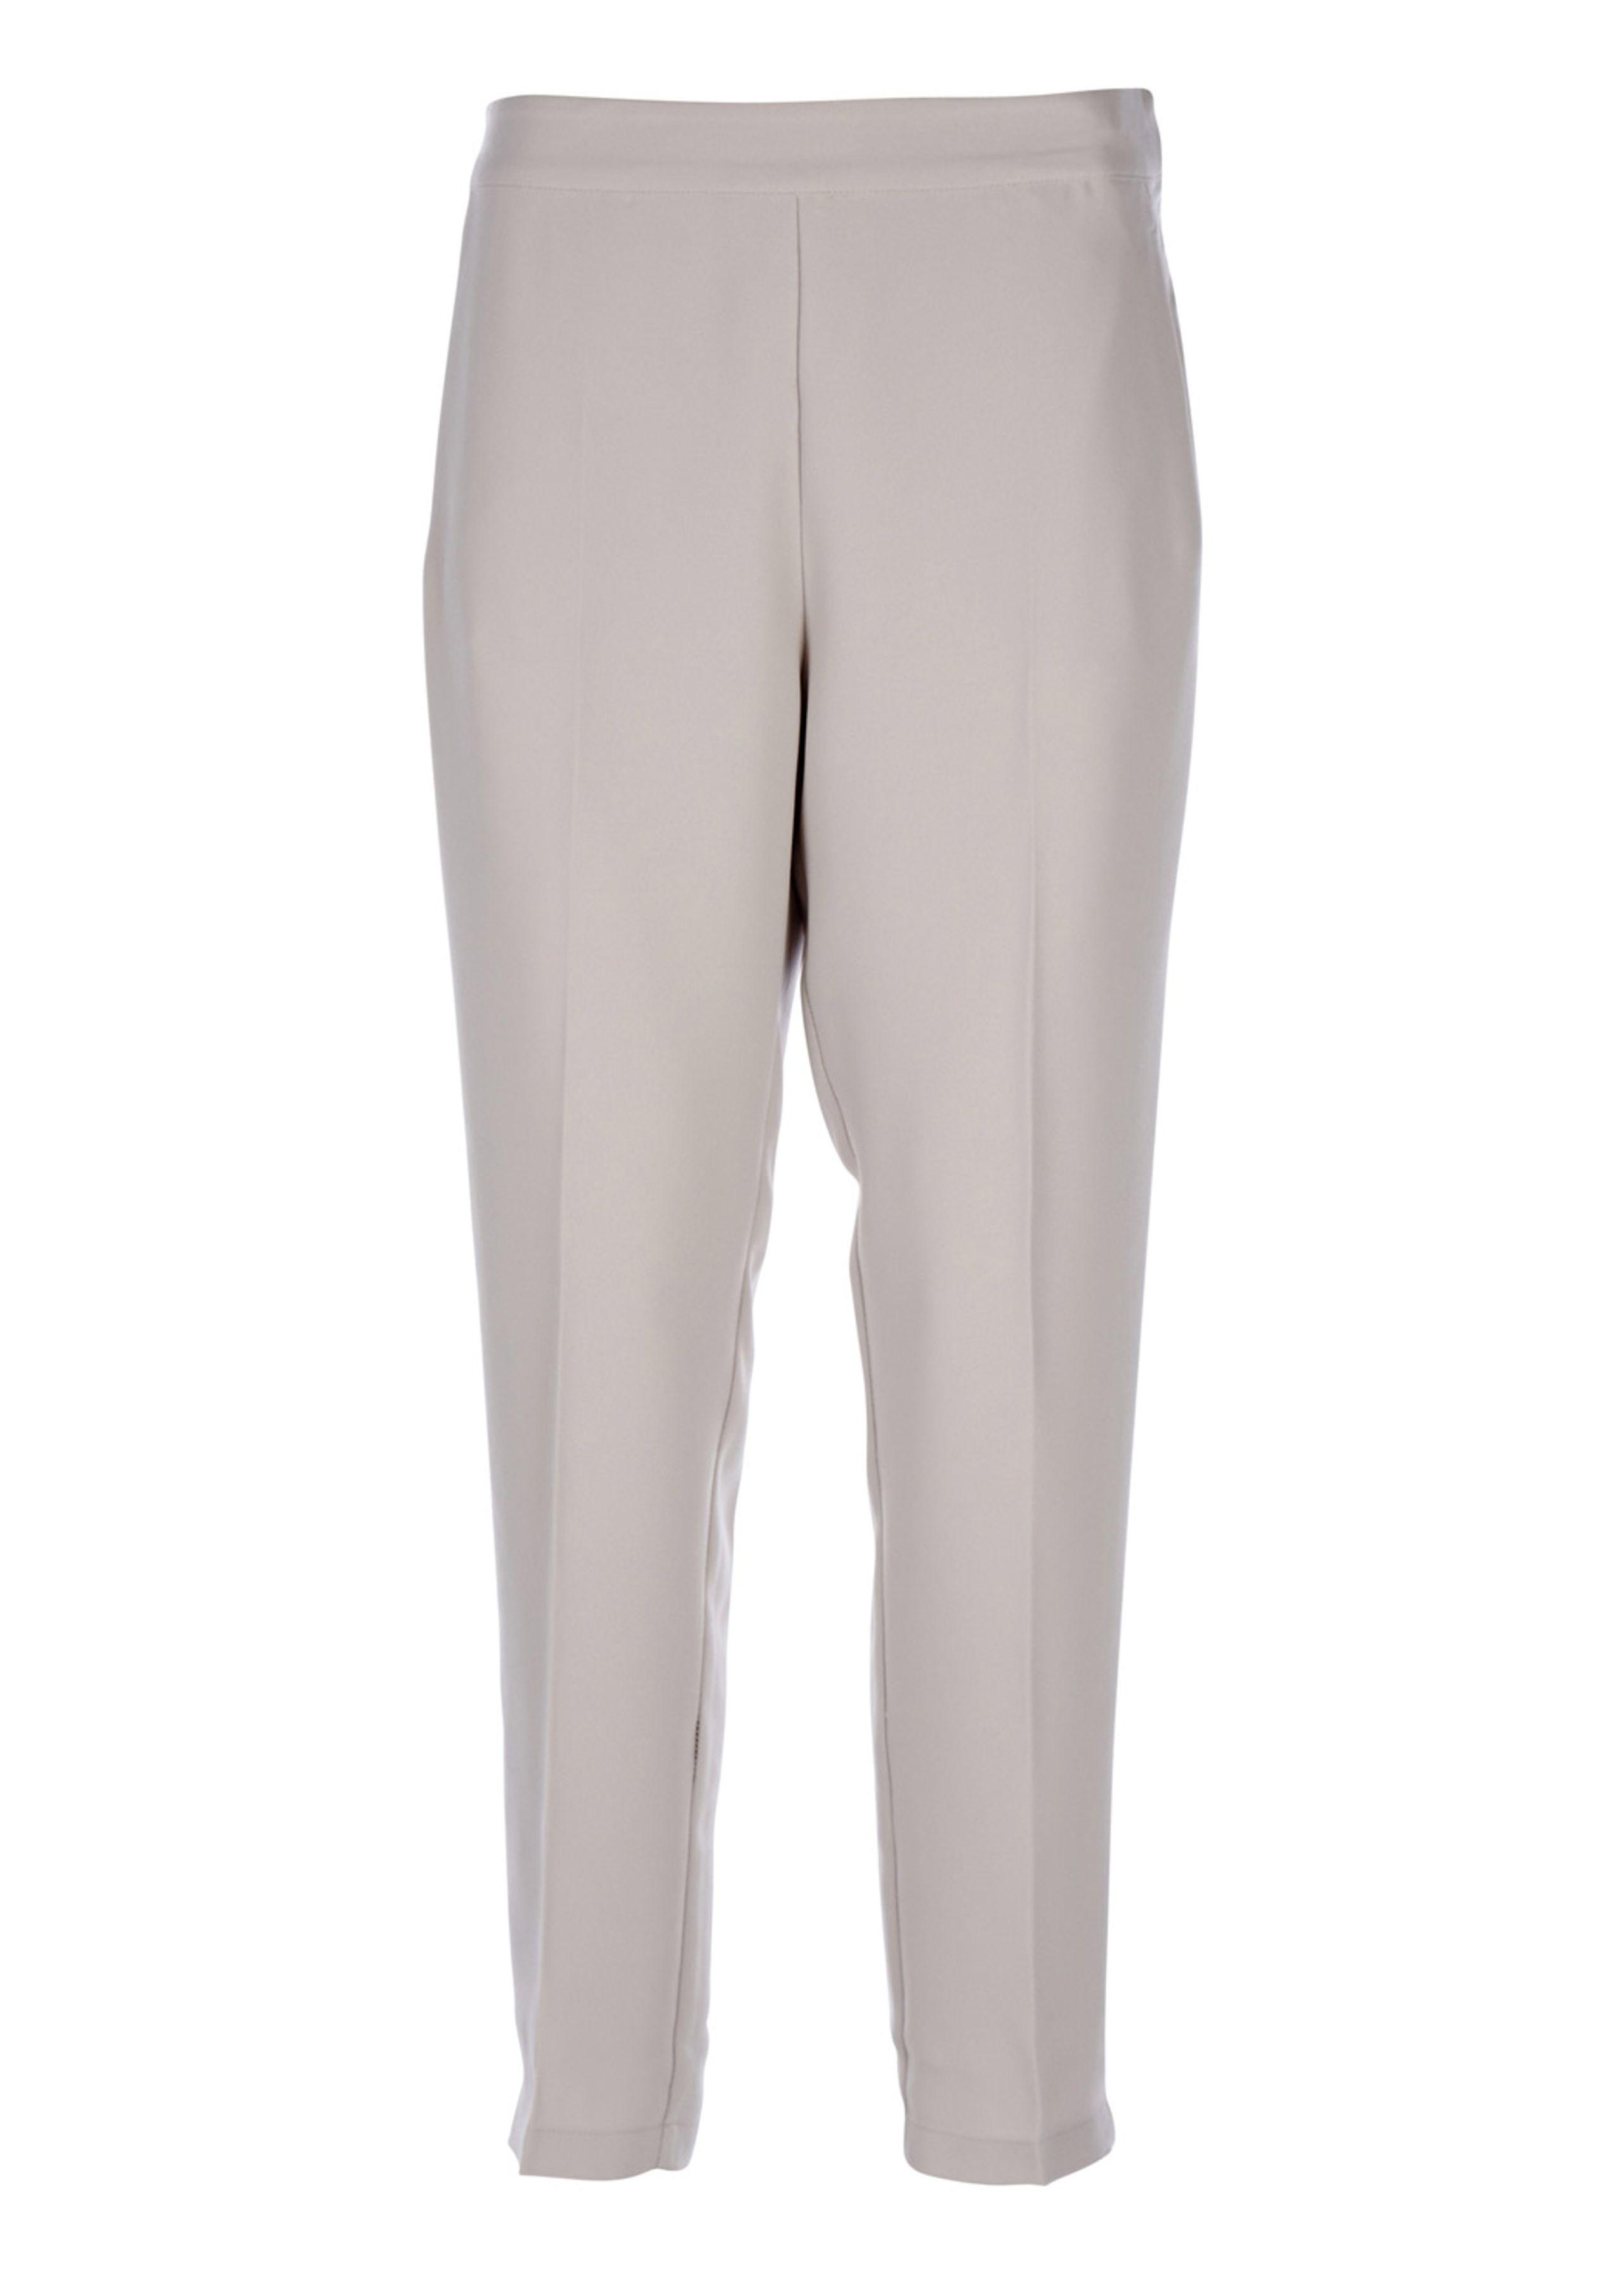 Image of   Steffi Cropped Pants